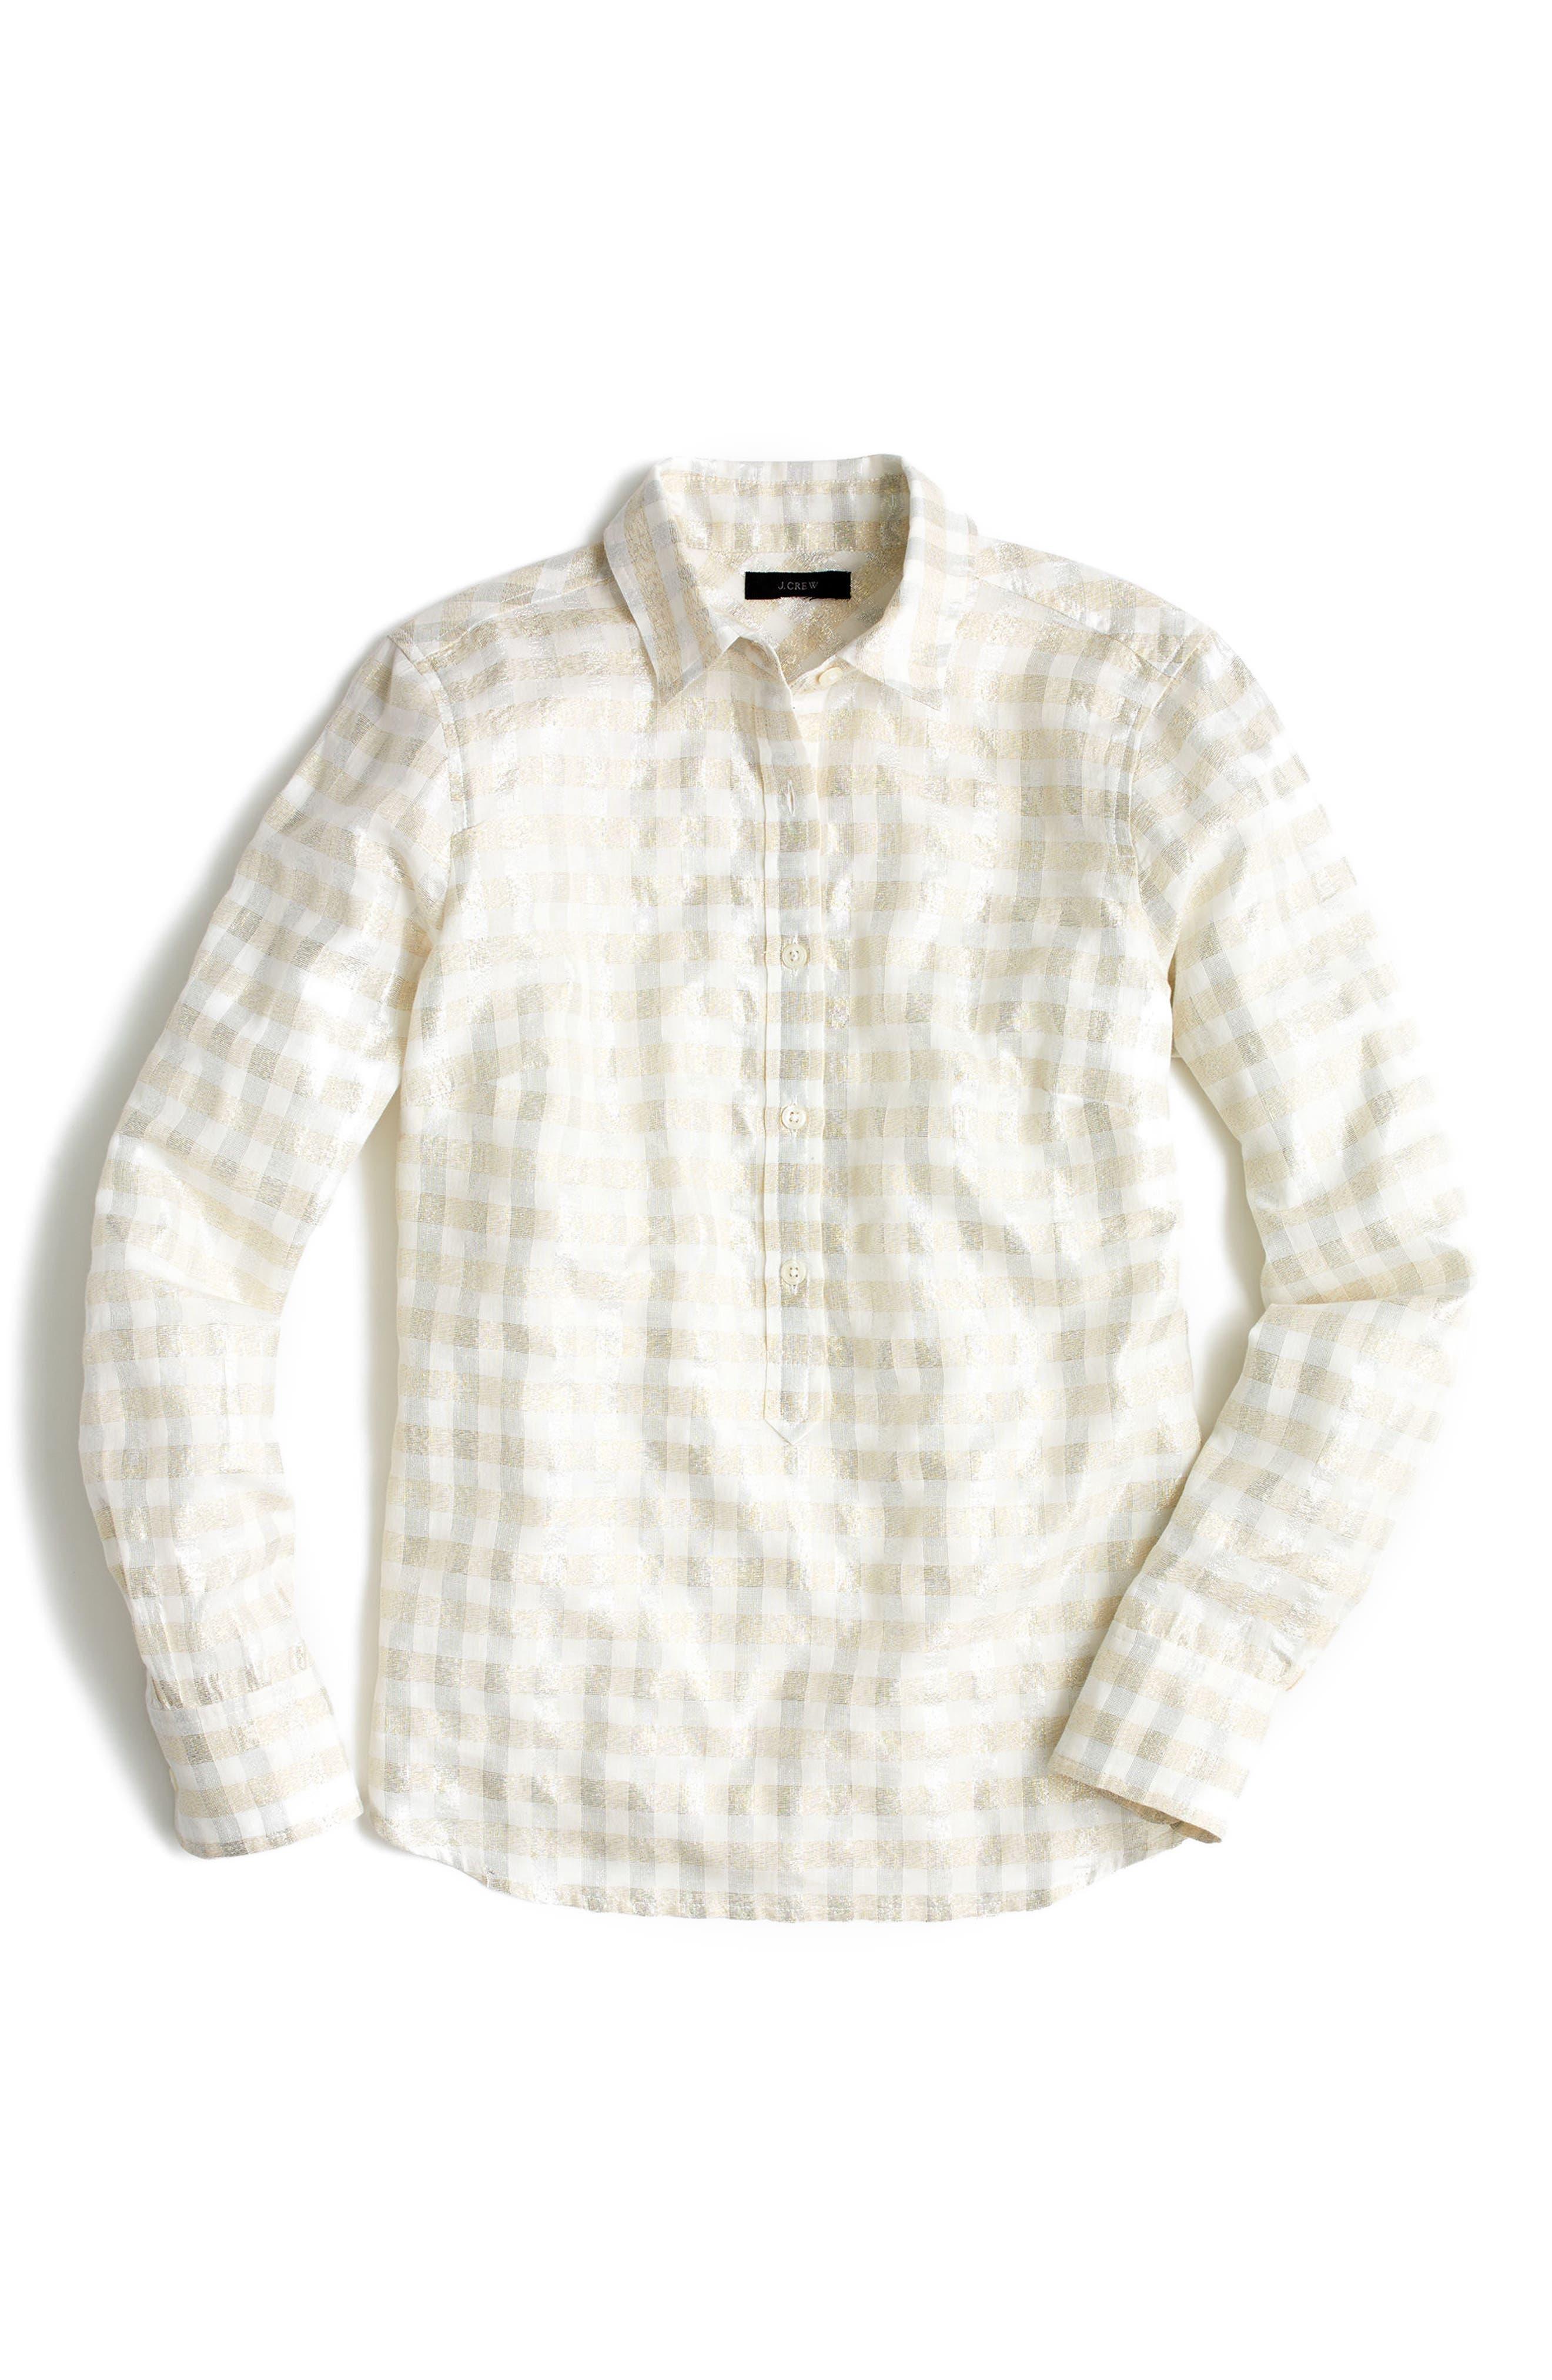 Alternate Image 3  - J.Crew Metallic Cotton Voile Popover Shirt (Regular & Petite)